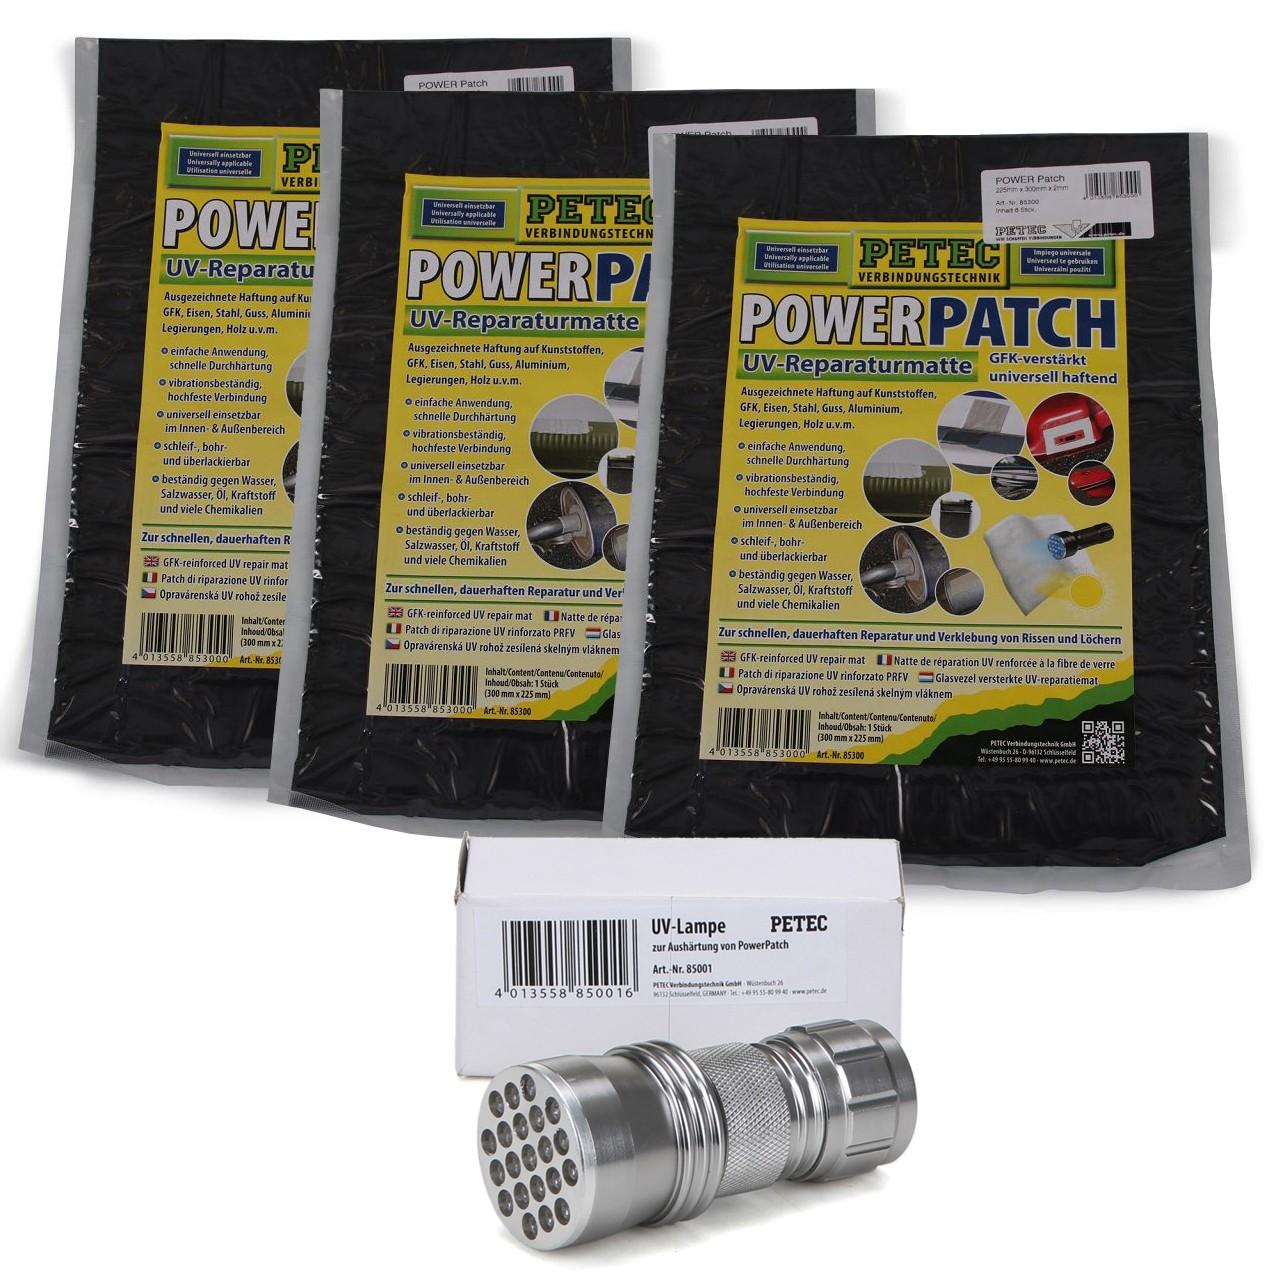 3x PETEC 85300 POWER PATCH Universalklebstoff UV-Reparaturmatte + 85001 UV-Lampe